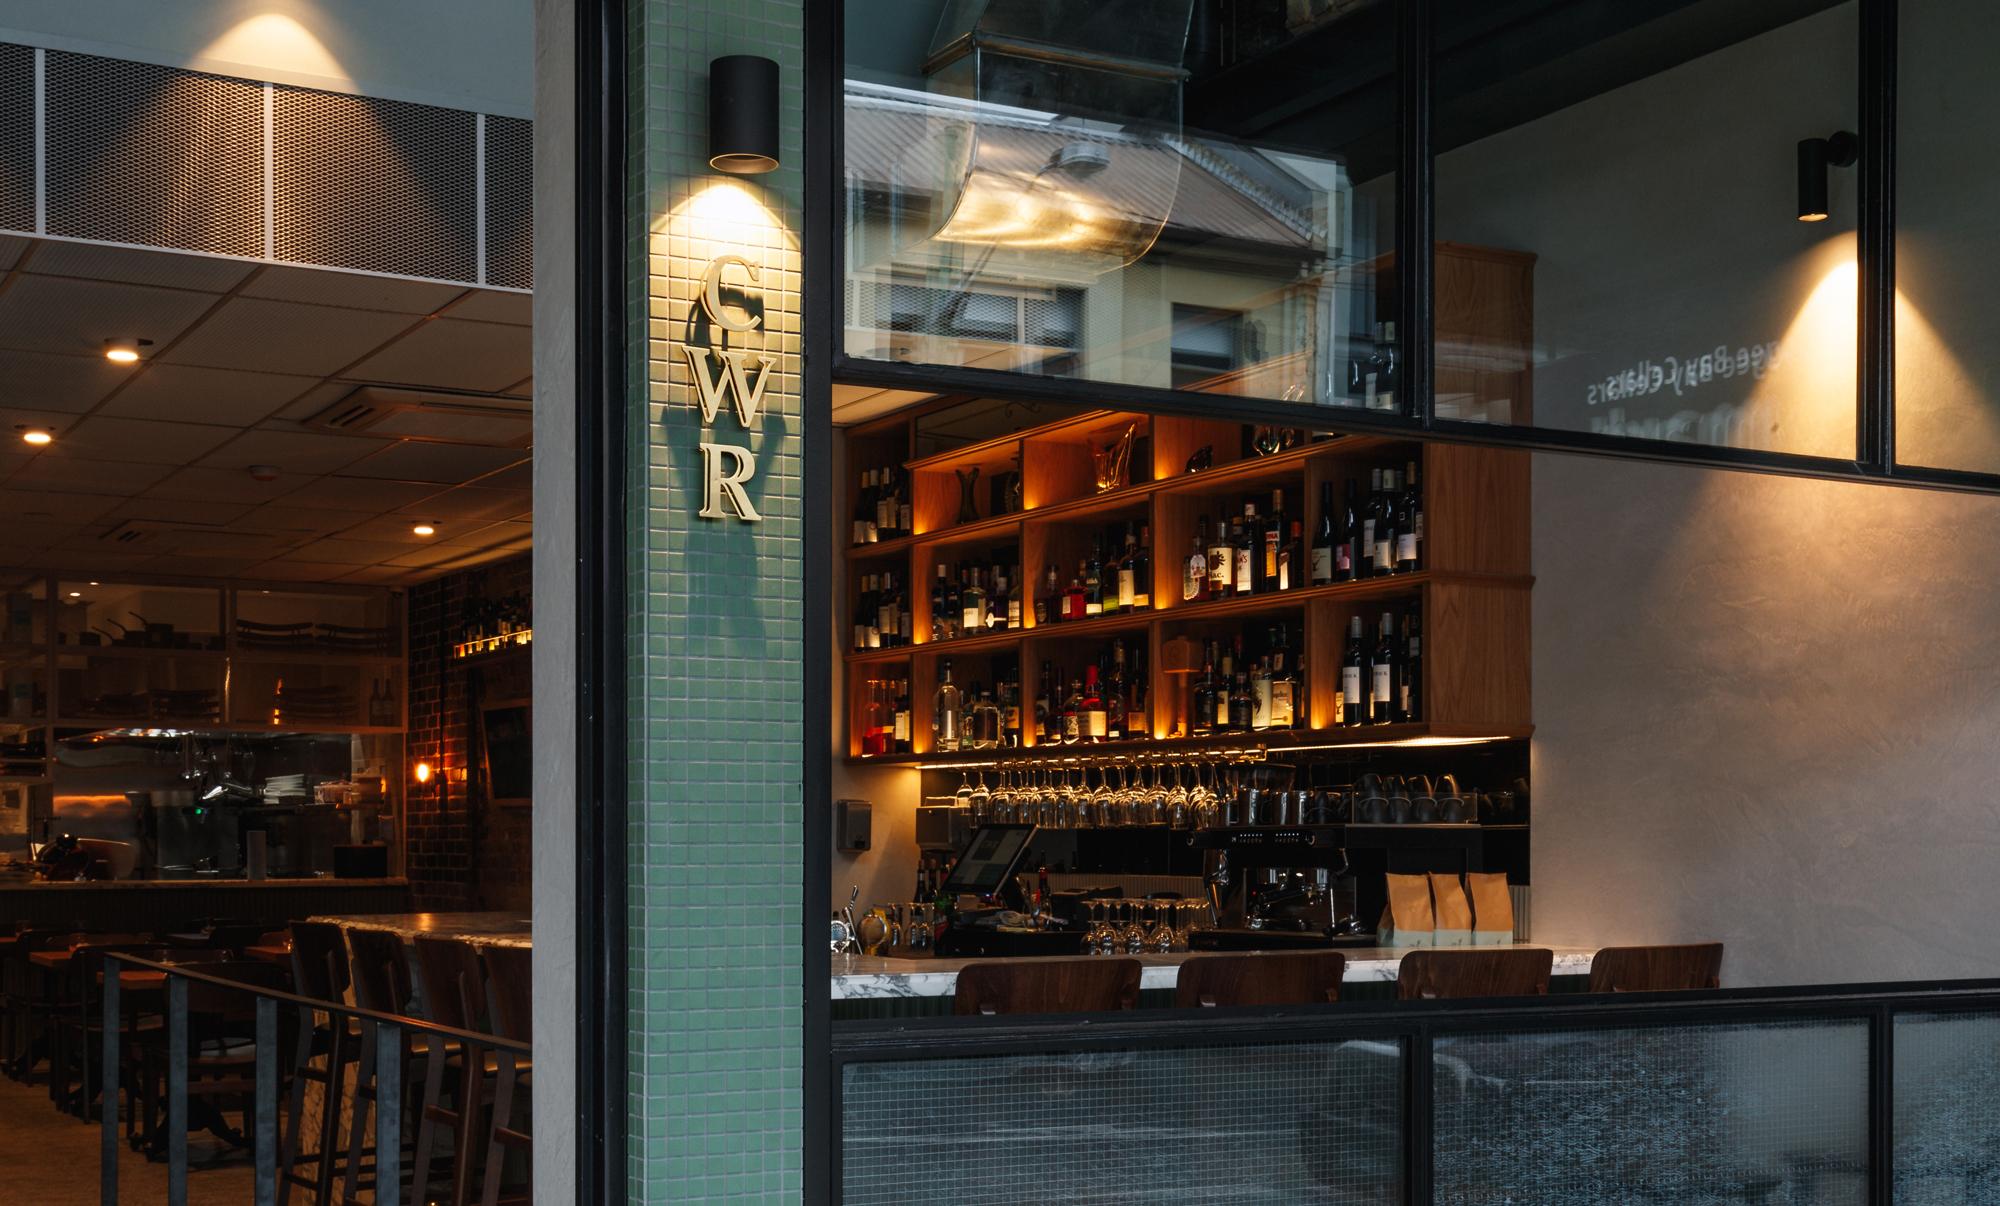 Distil coogee wine room front facade logo branding